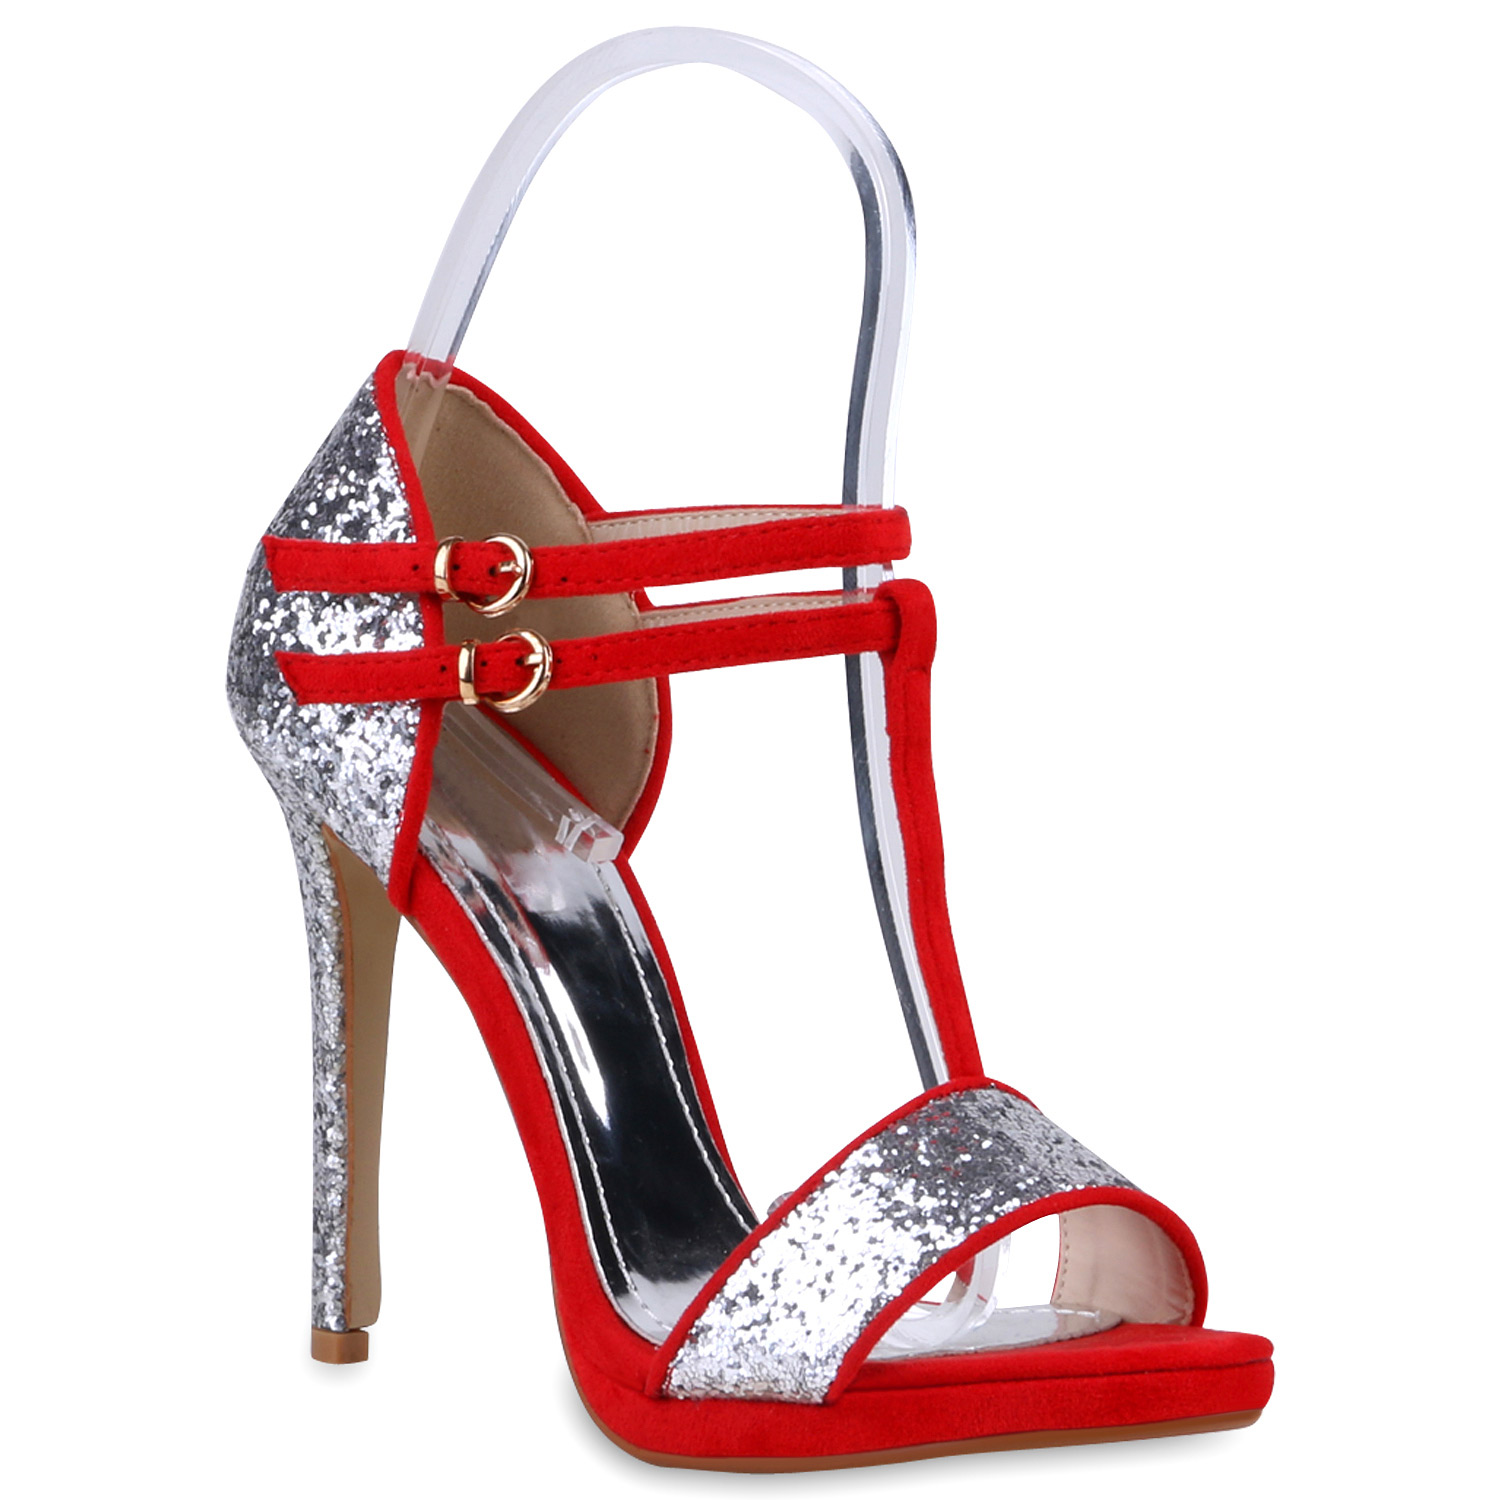 damen glitzer sandaletten high heels riemchen schuhe party. Black Bedroom Furniture Sets. Home Design Ideas